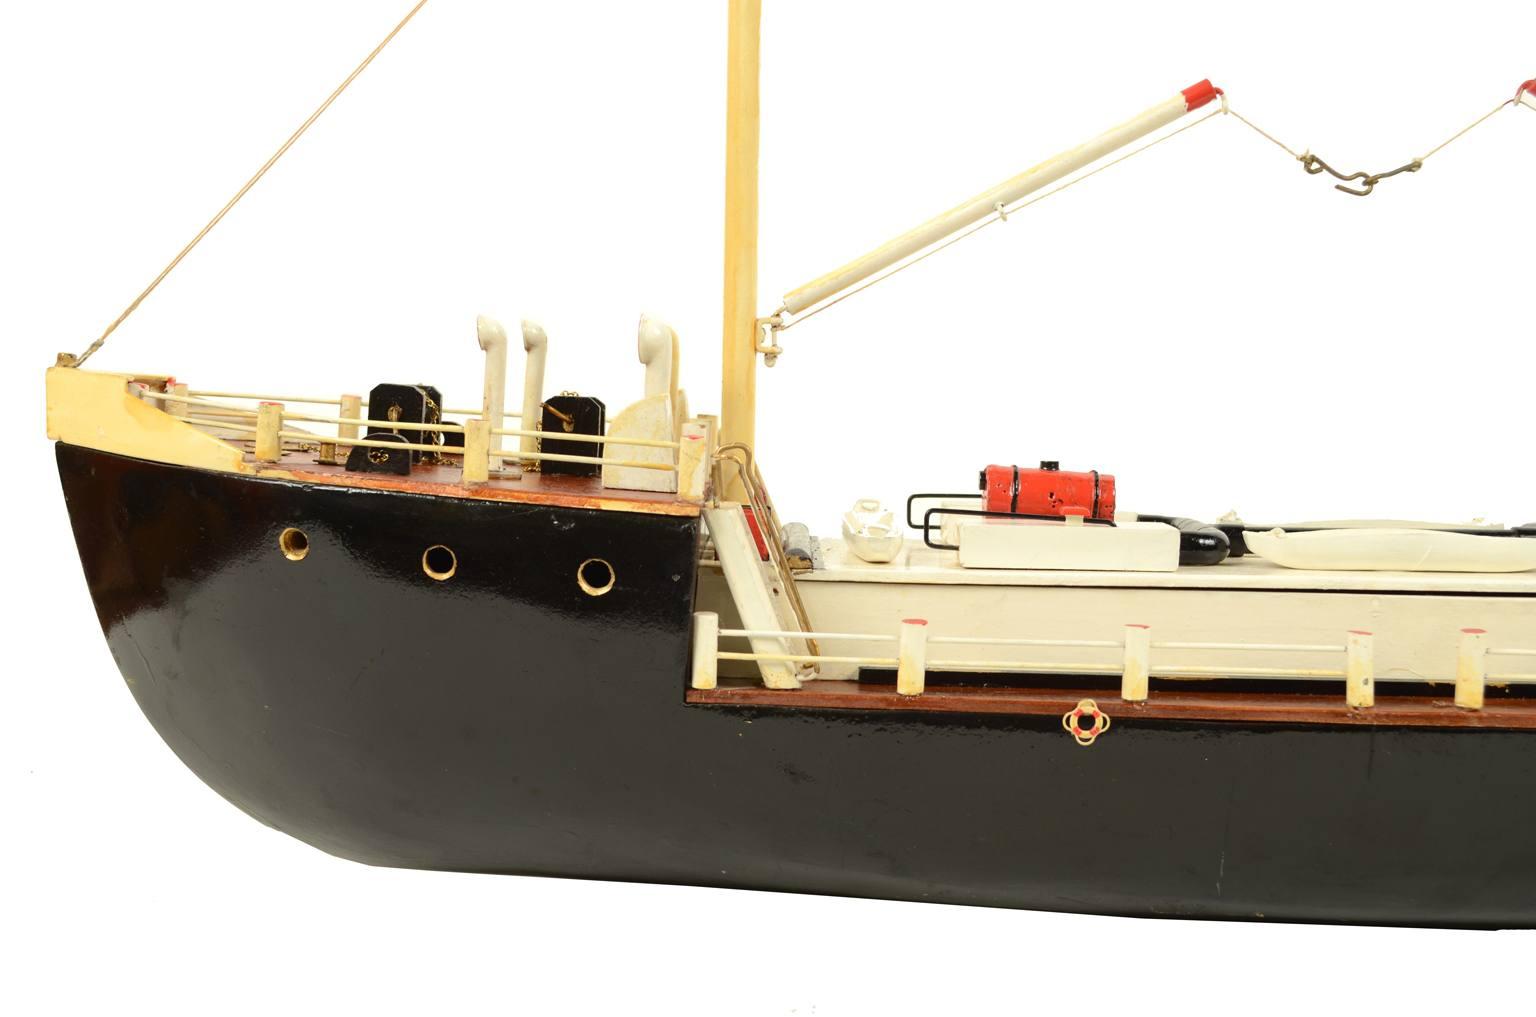 Modelli di navi d'epoca/4854-Modellino francese